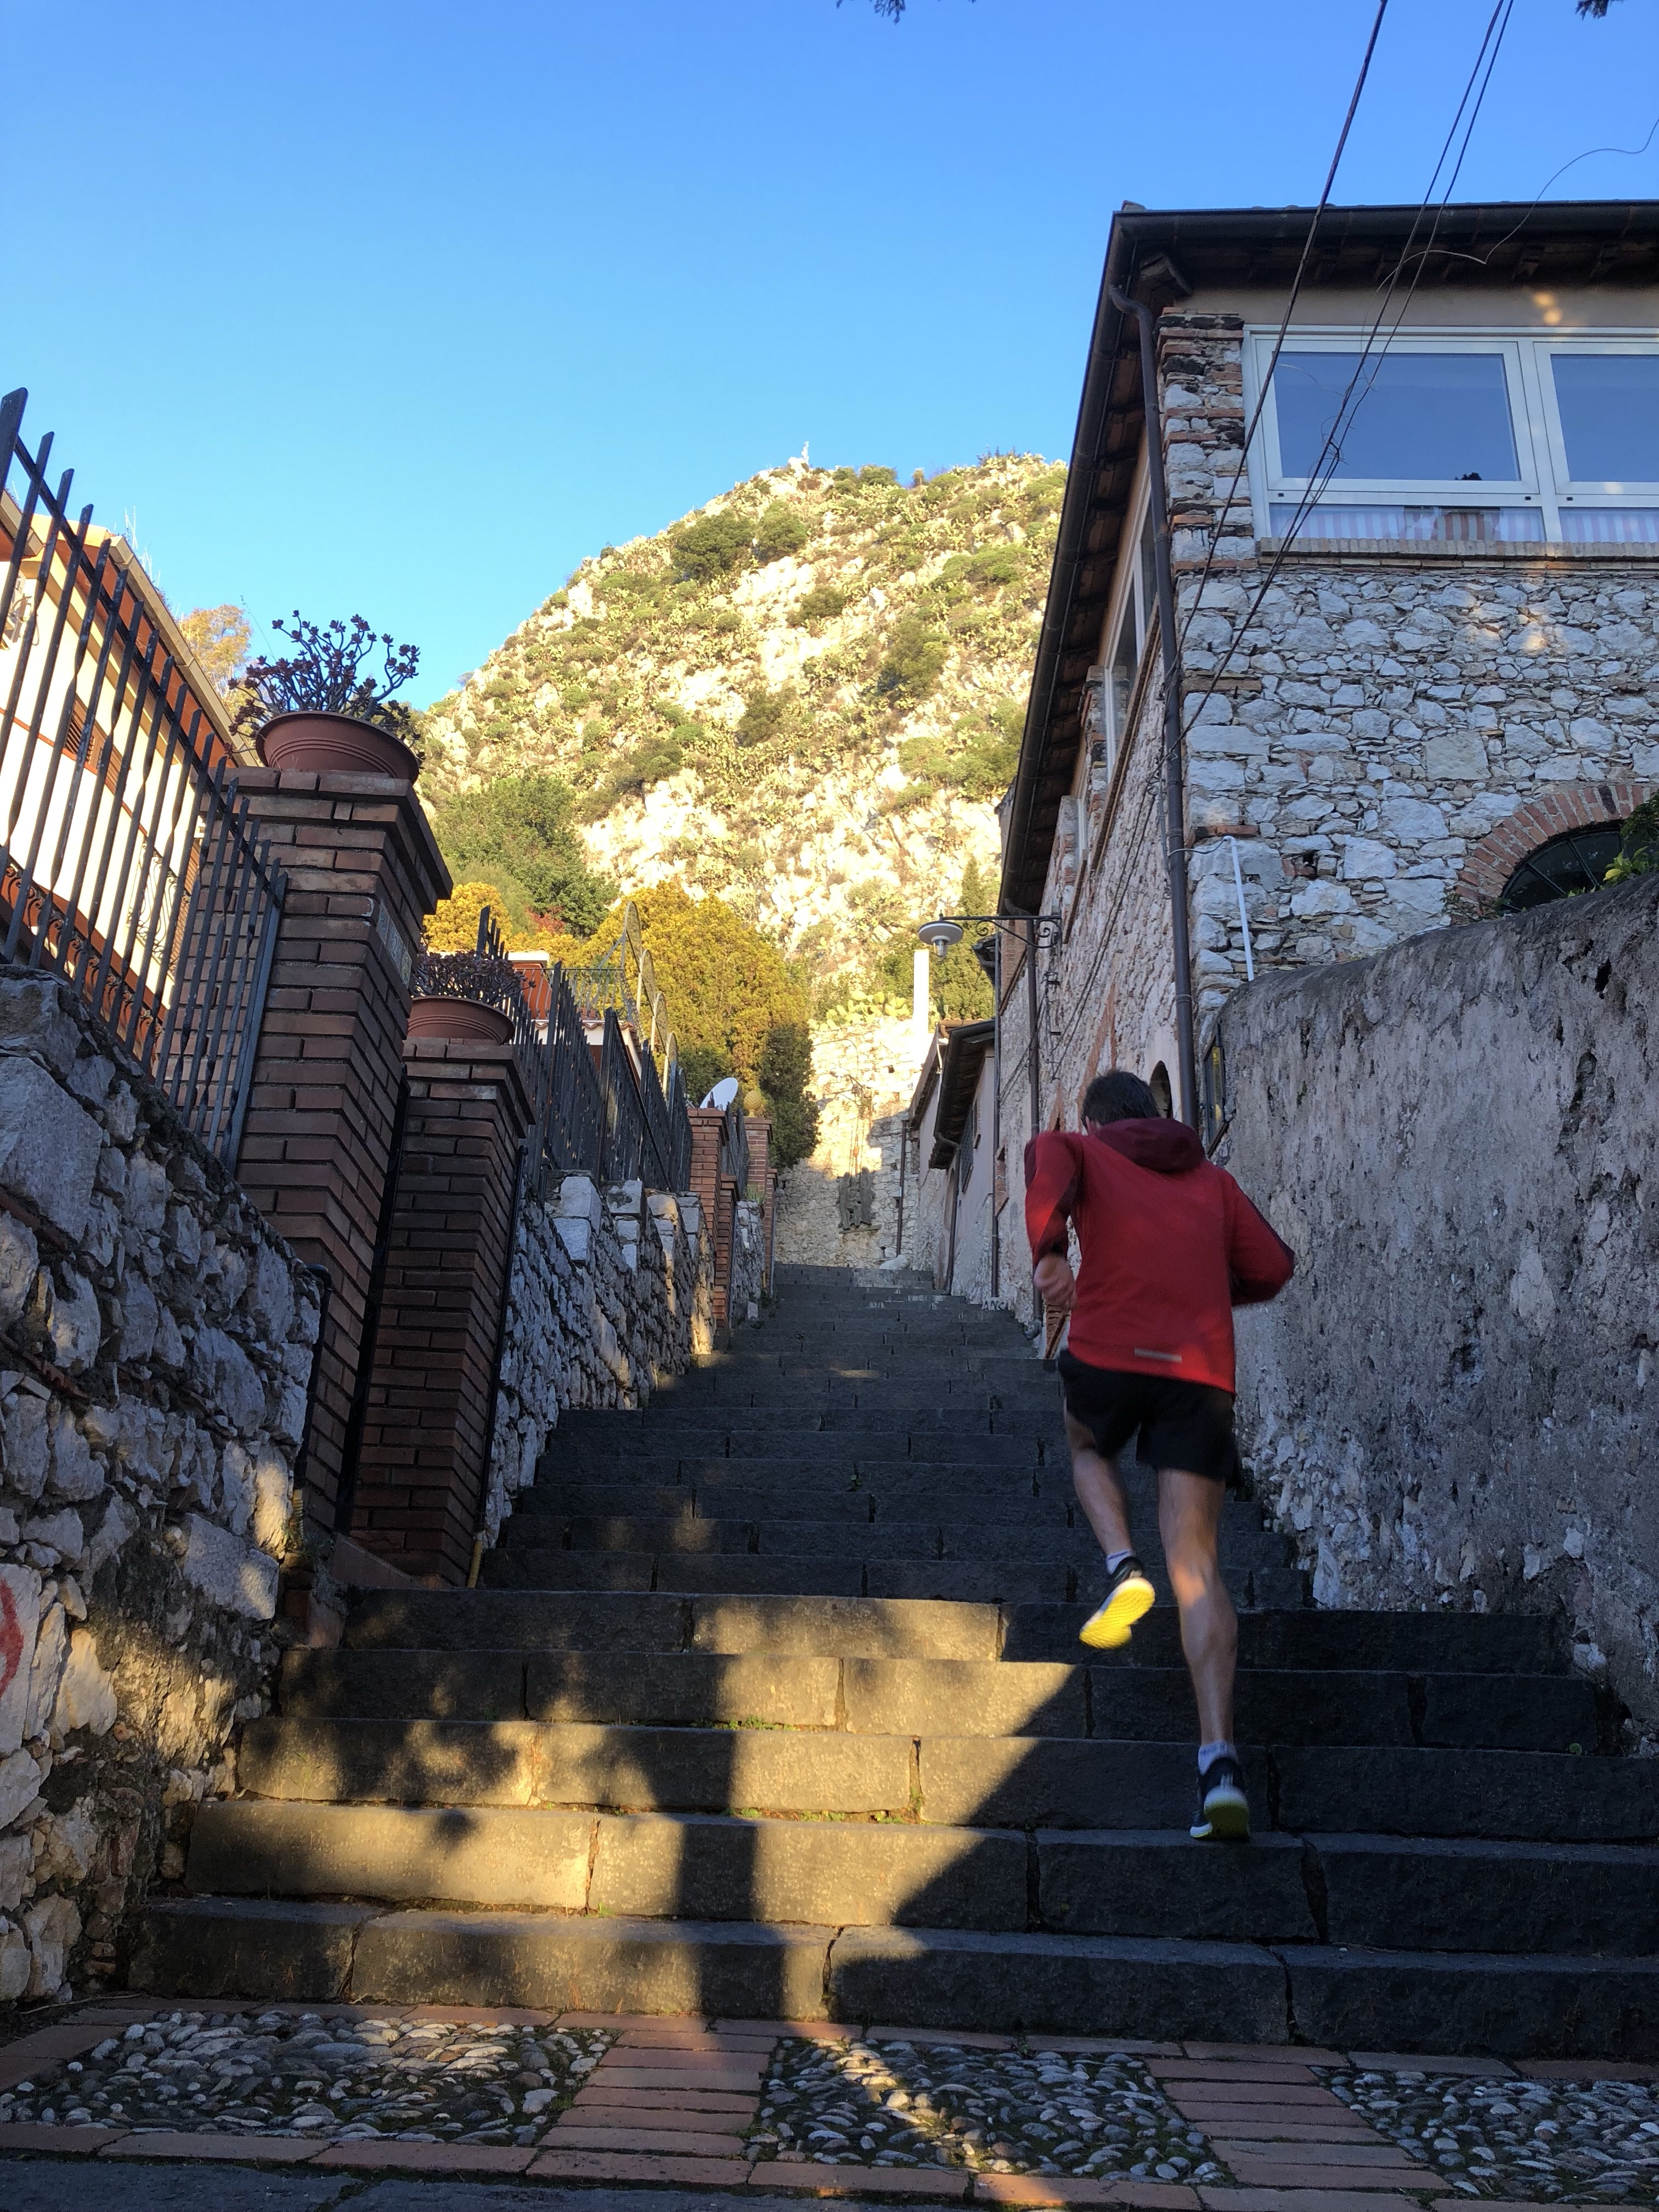 Climbing the stairs in Taormina